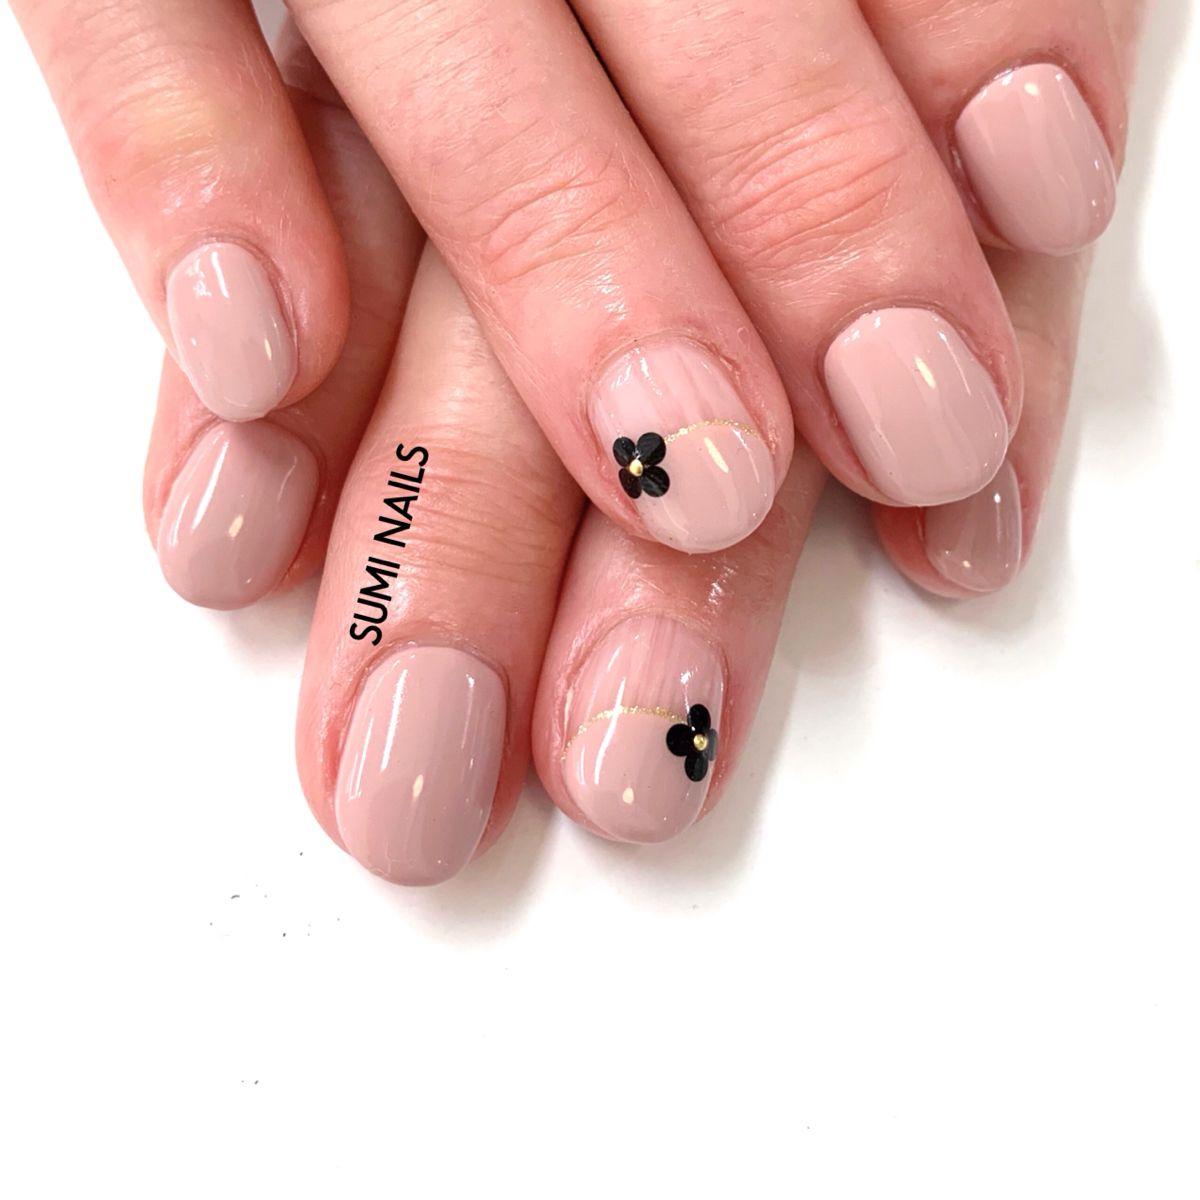 #accentnails #simplenailart #nudepinknails #blackflowers #flowernails #suminails #ladiposh #sydneynailart #gelnailsdesign #nailart